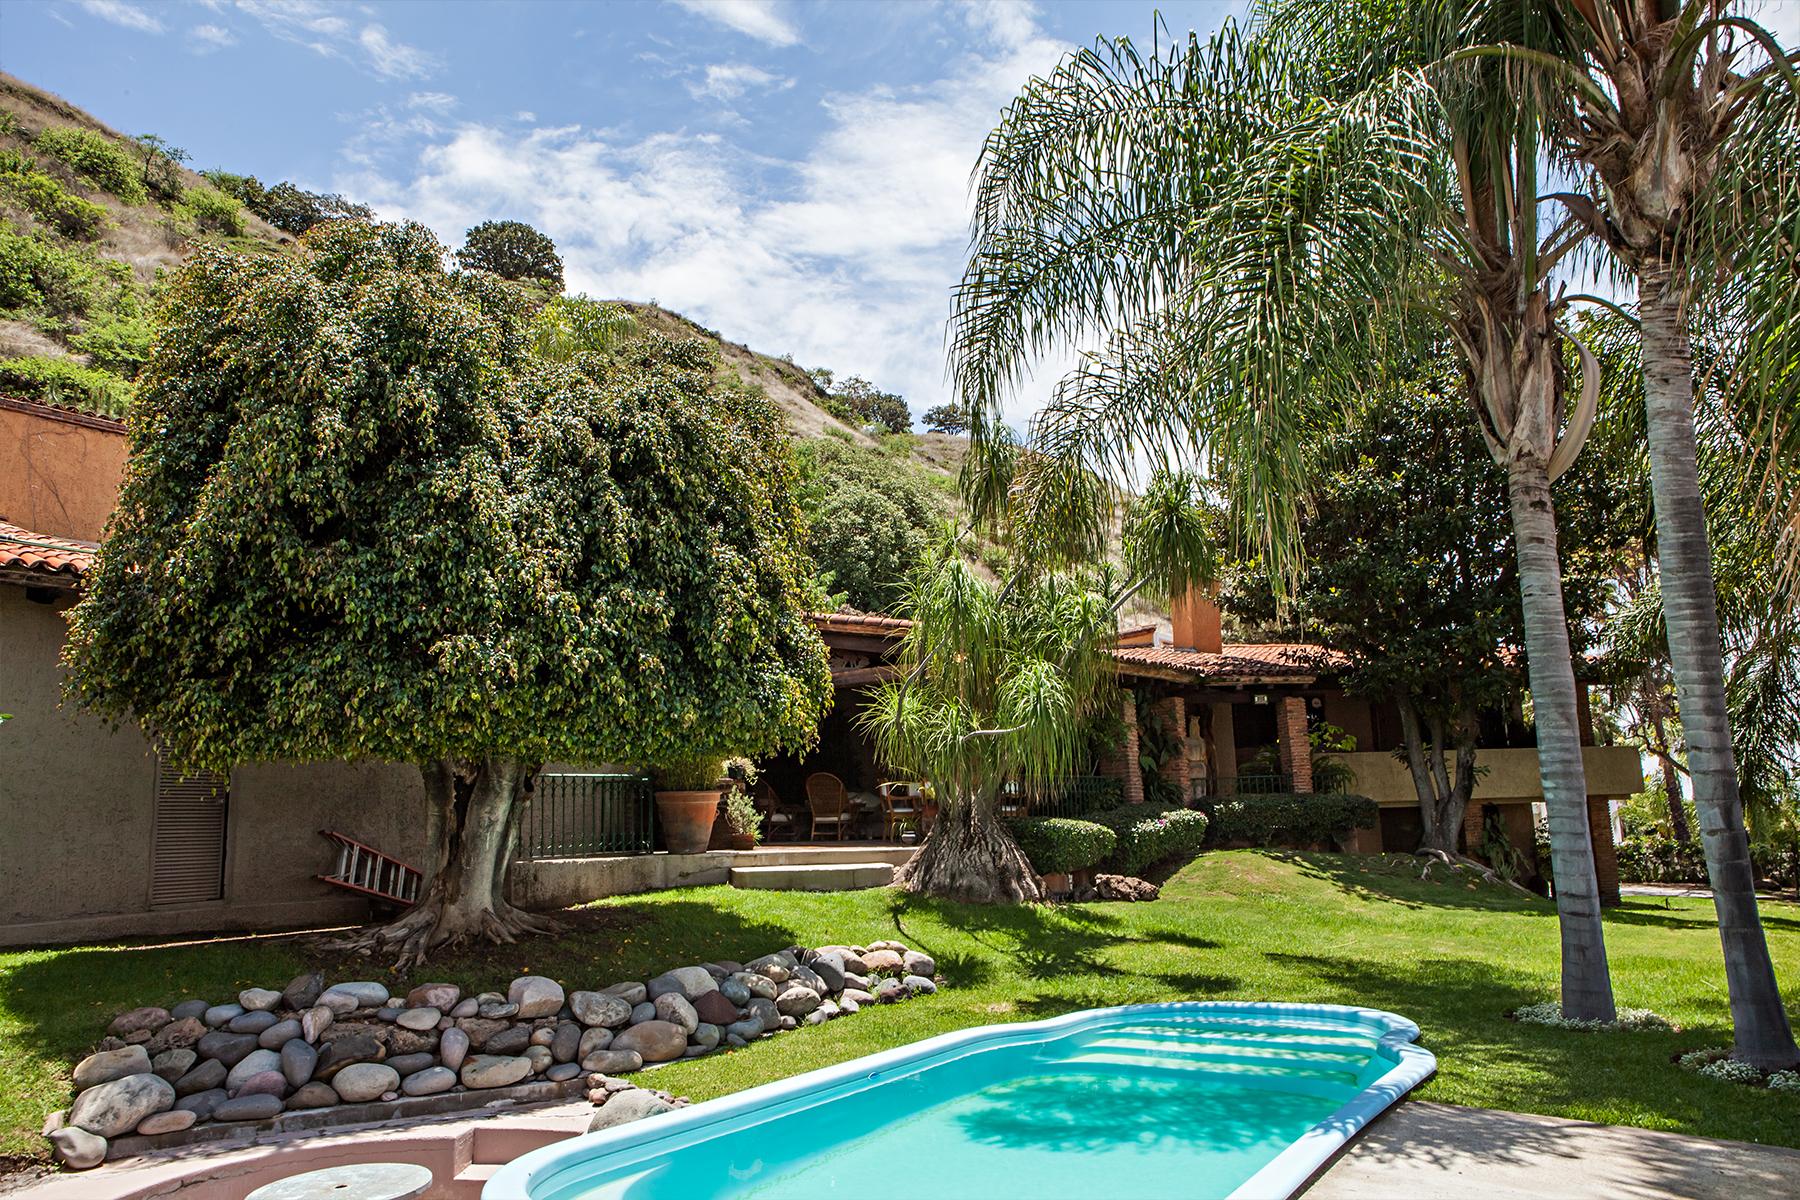 Single Family Home for Sale at Casa Estrella, Santa Anita Club de Golf Guadalajara, Jalisco 45645 Mexico